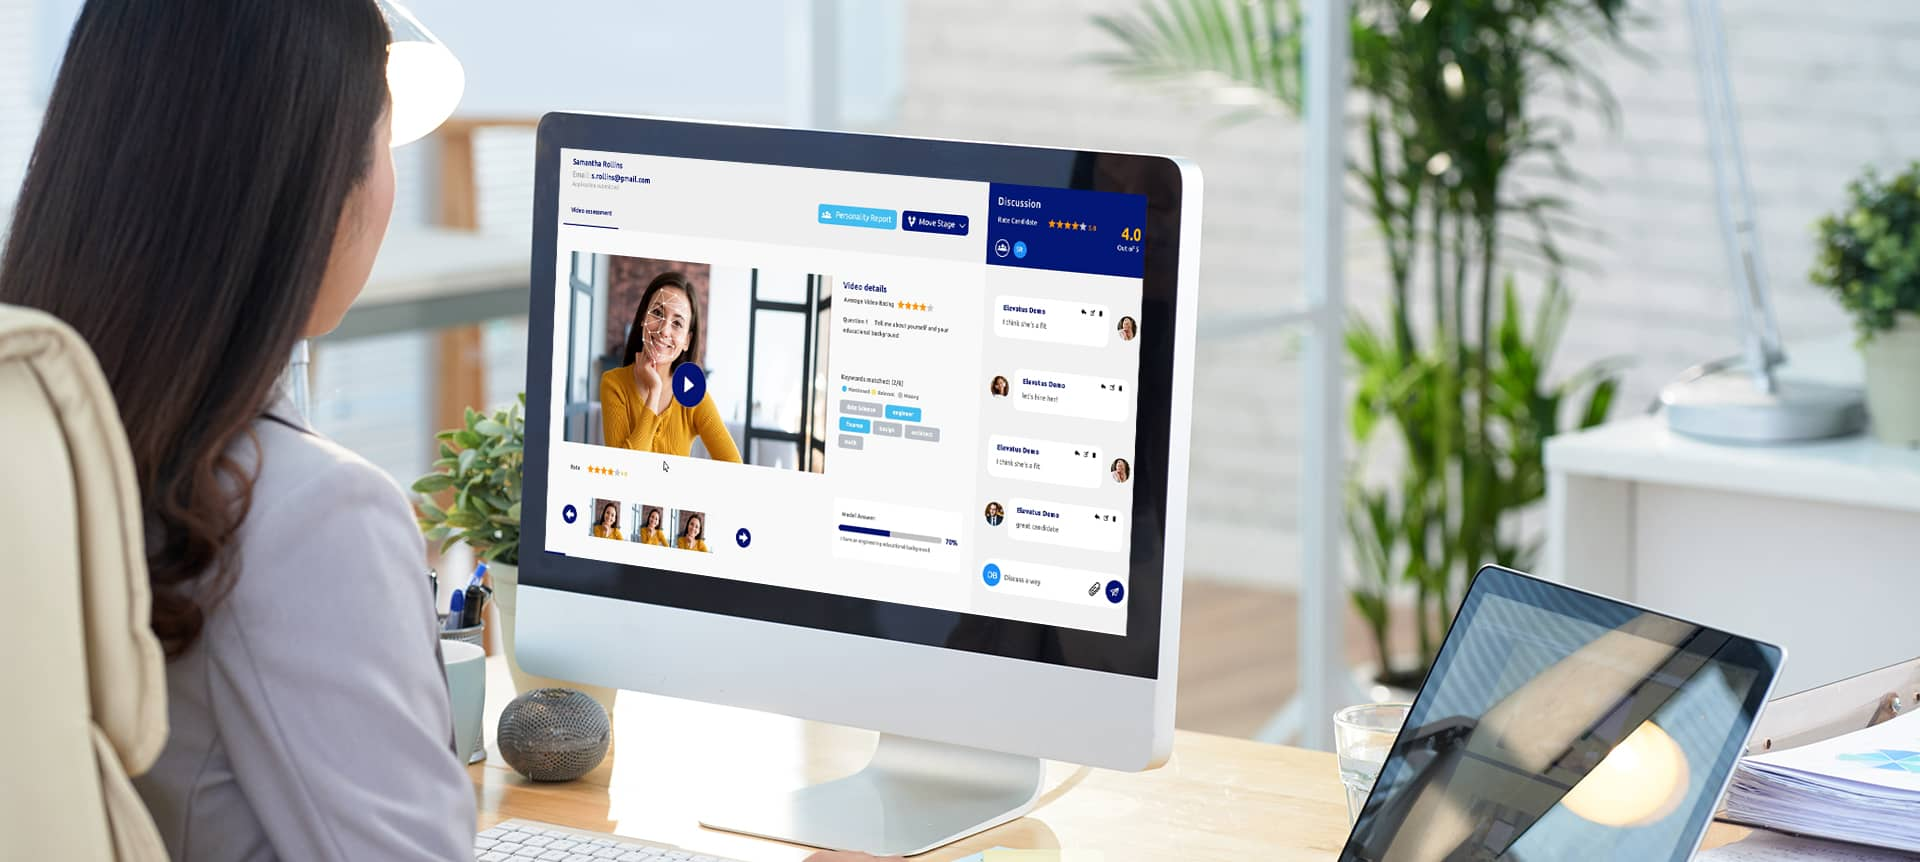 A recruiter using a video interviewing software